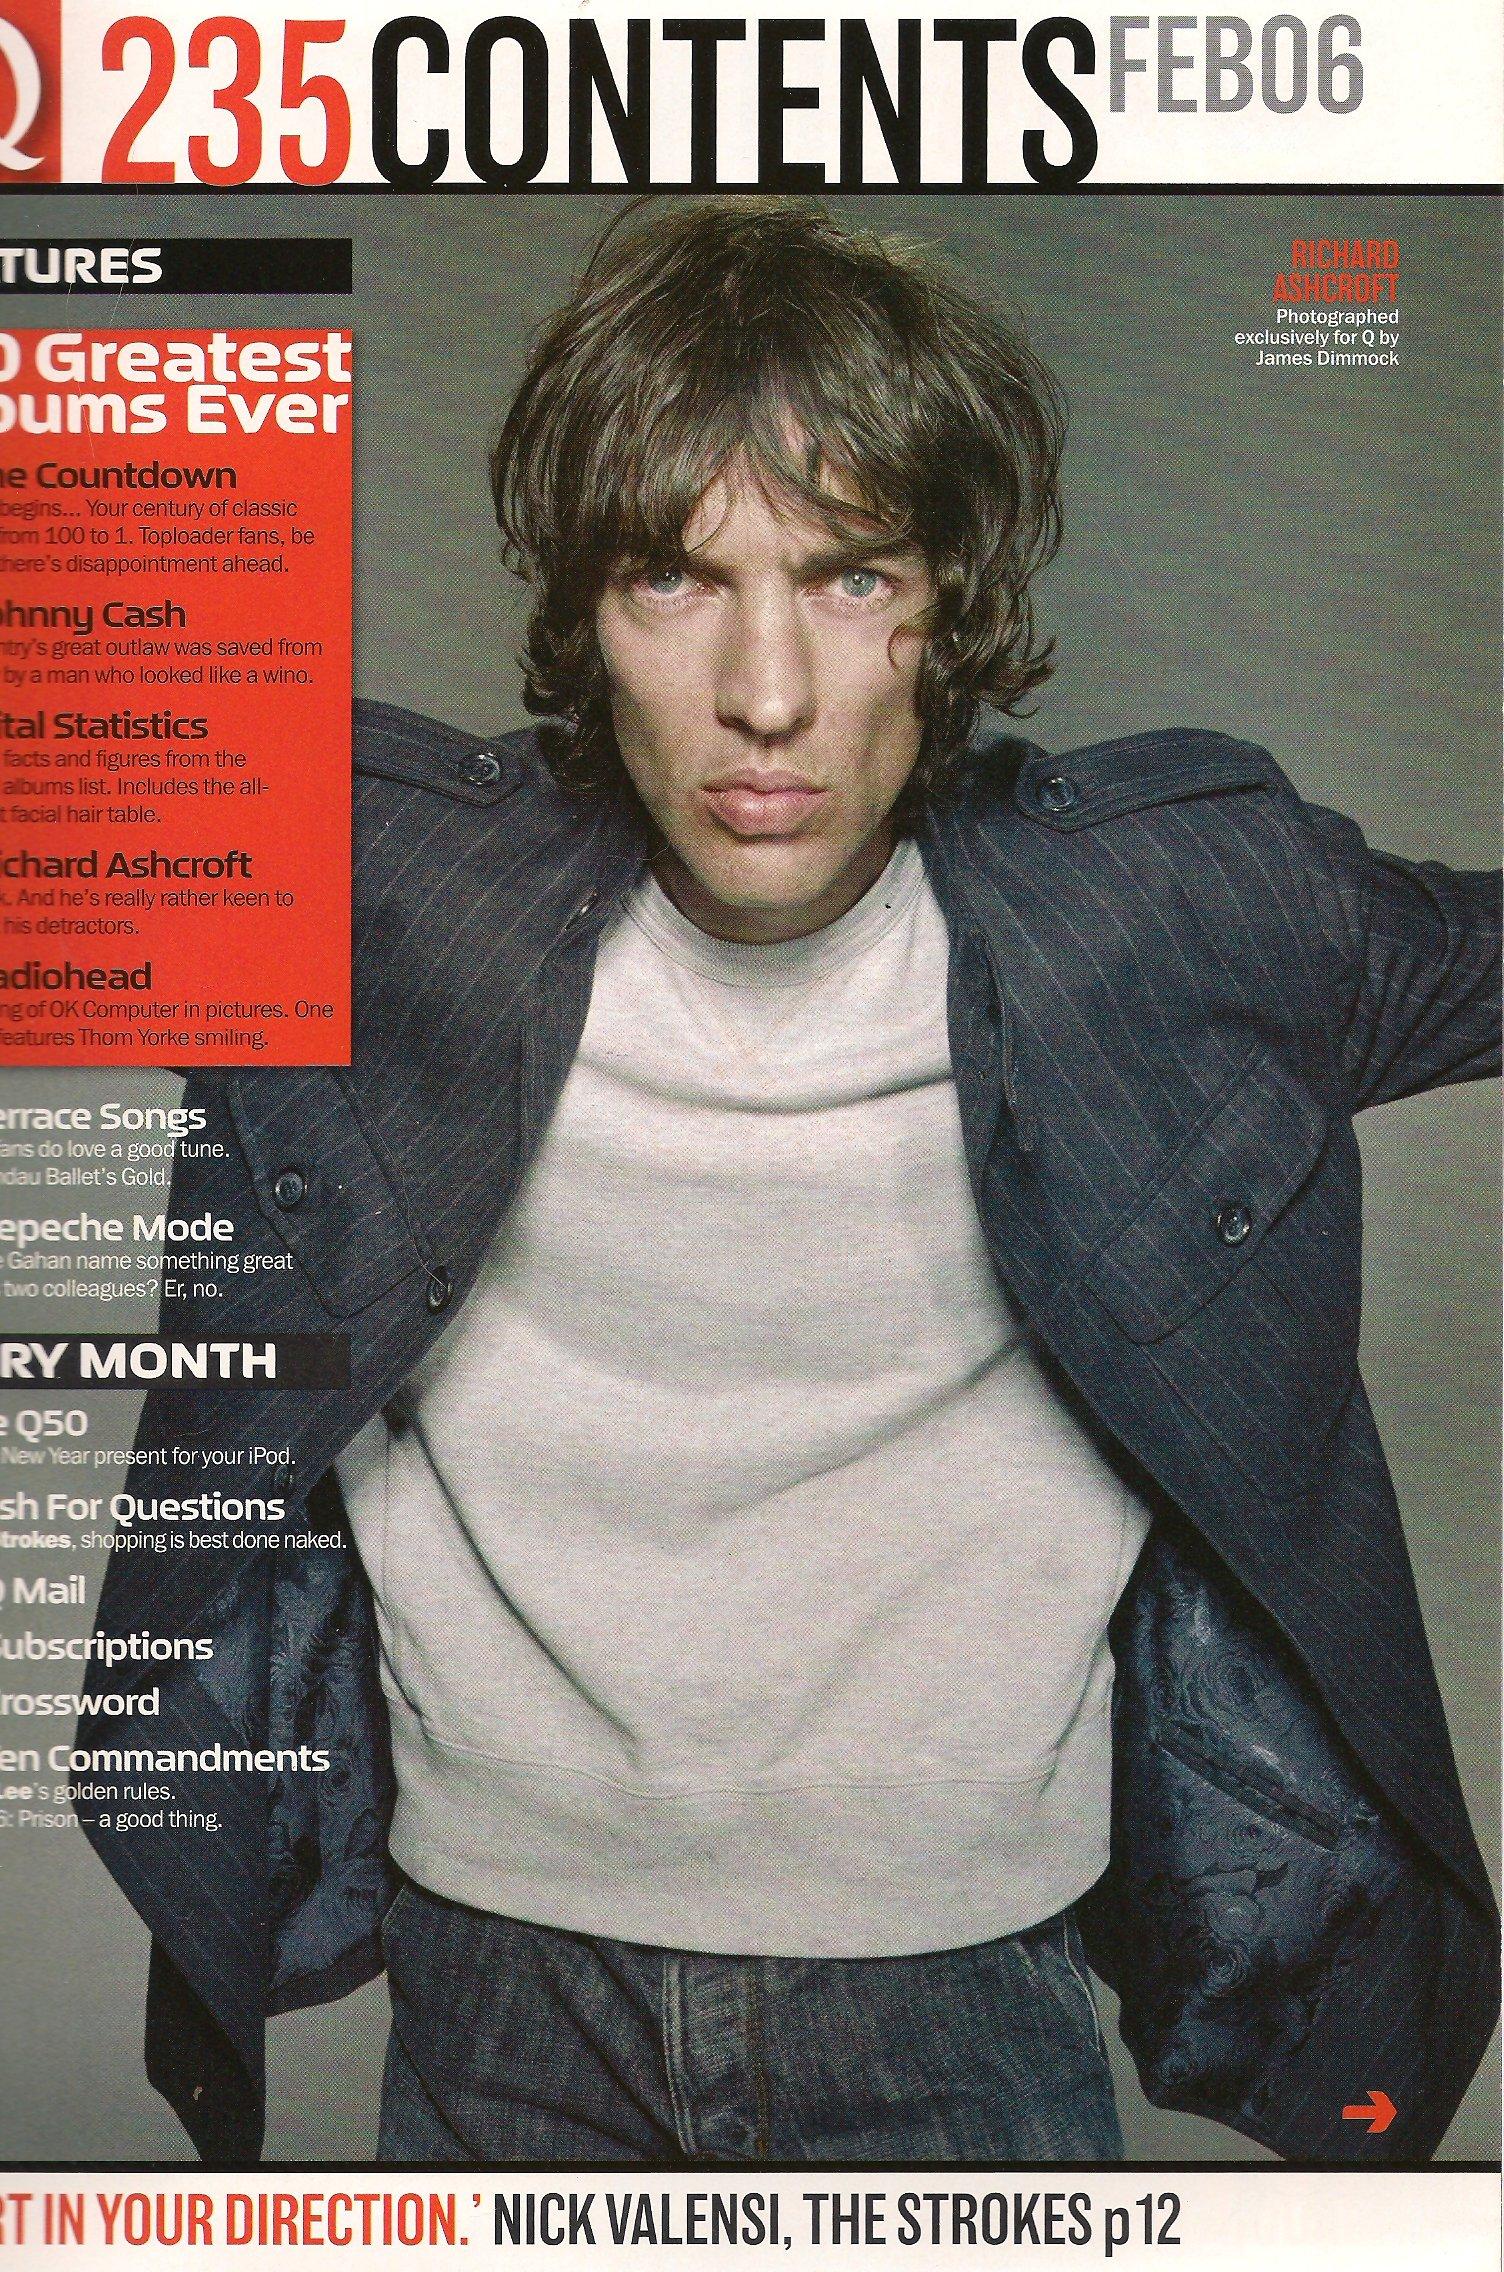 Q magazine - 235 - February 2006 - The 100 Greatest Albums Ever